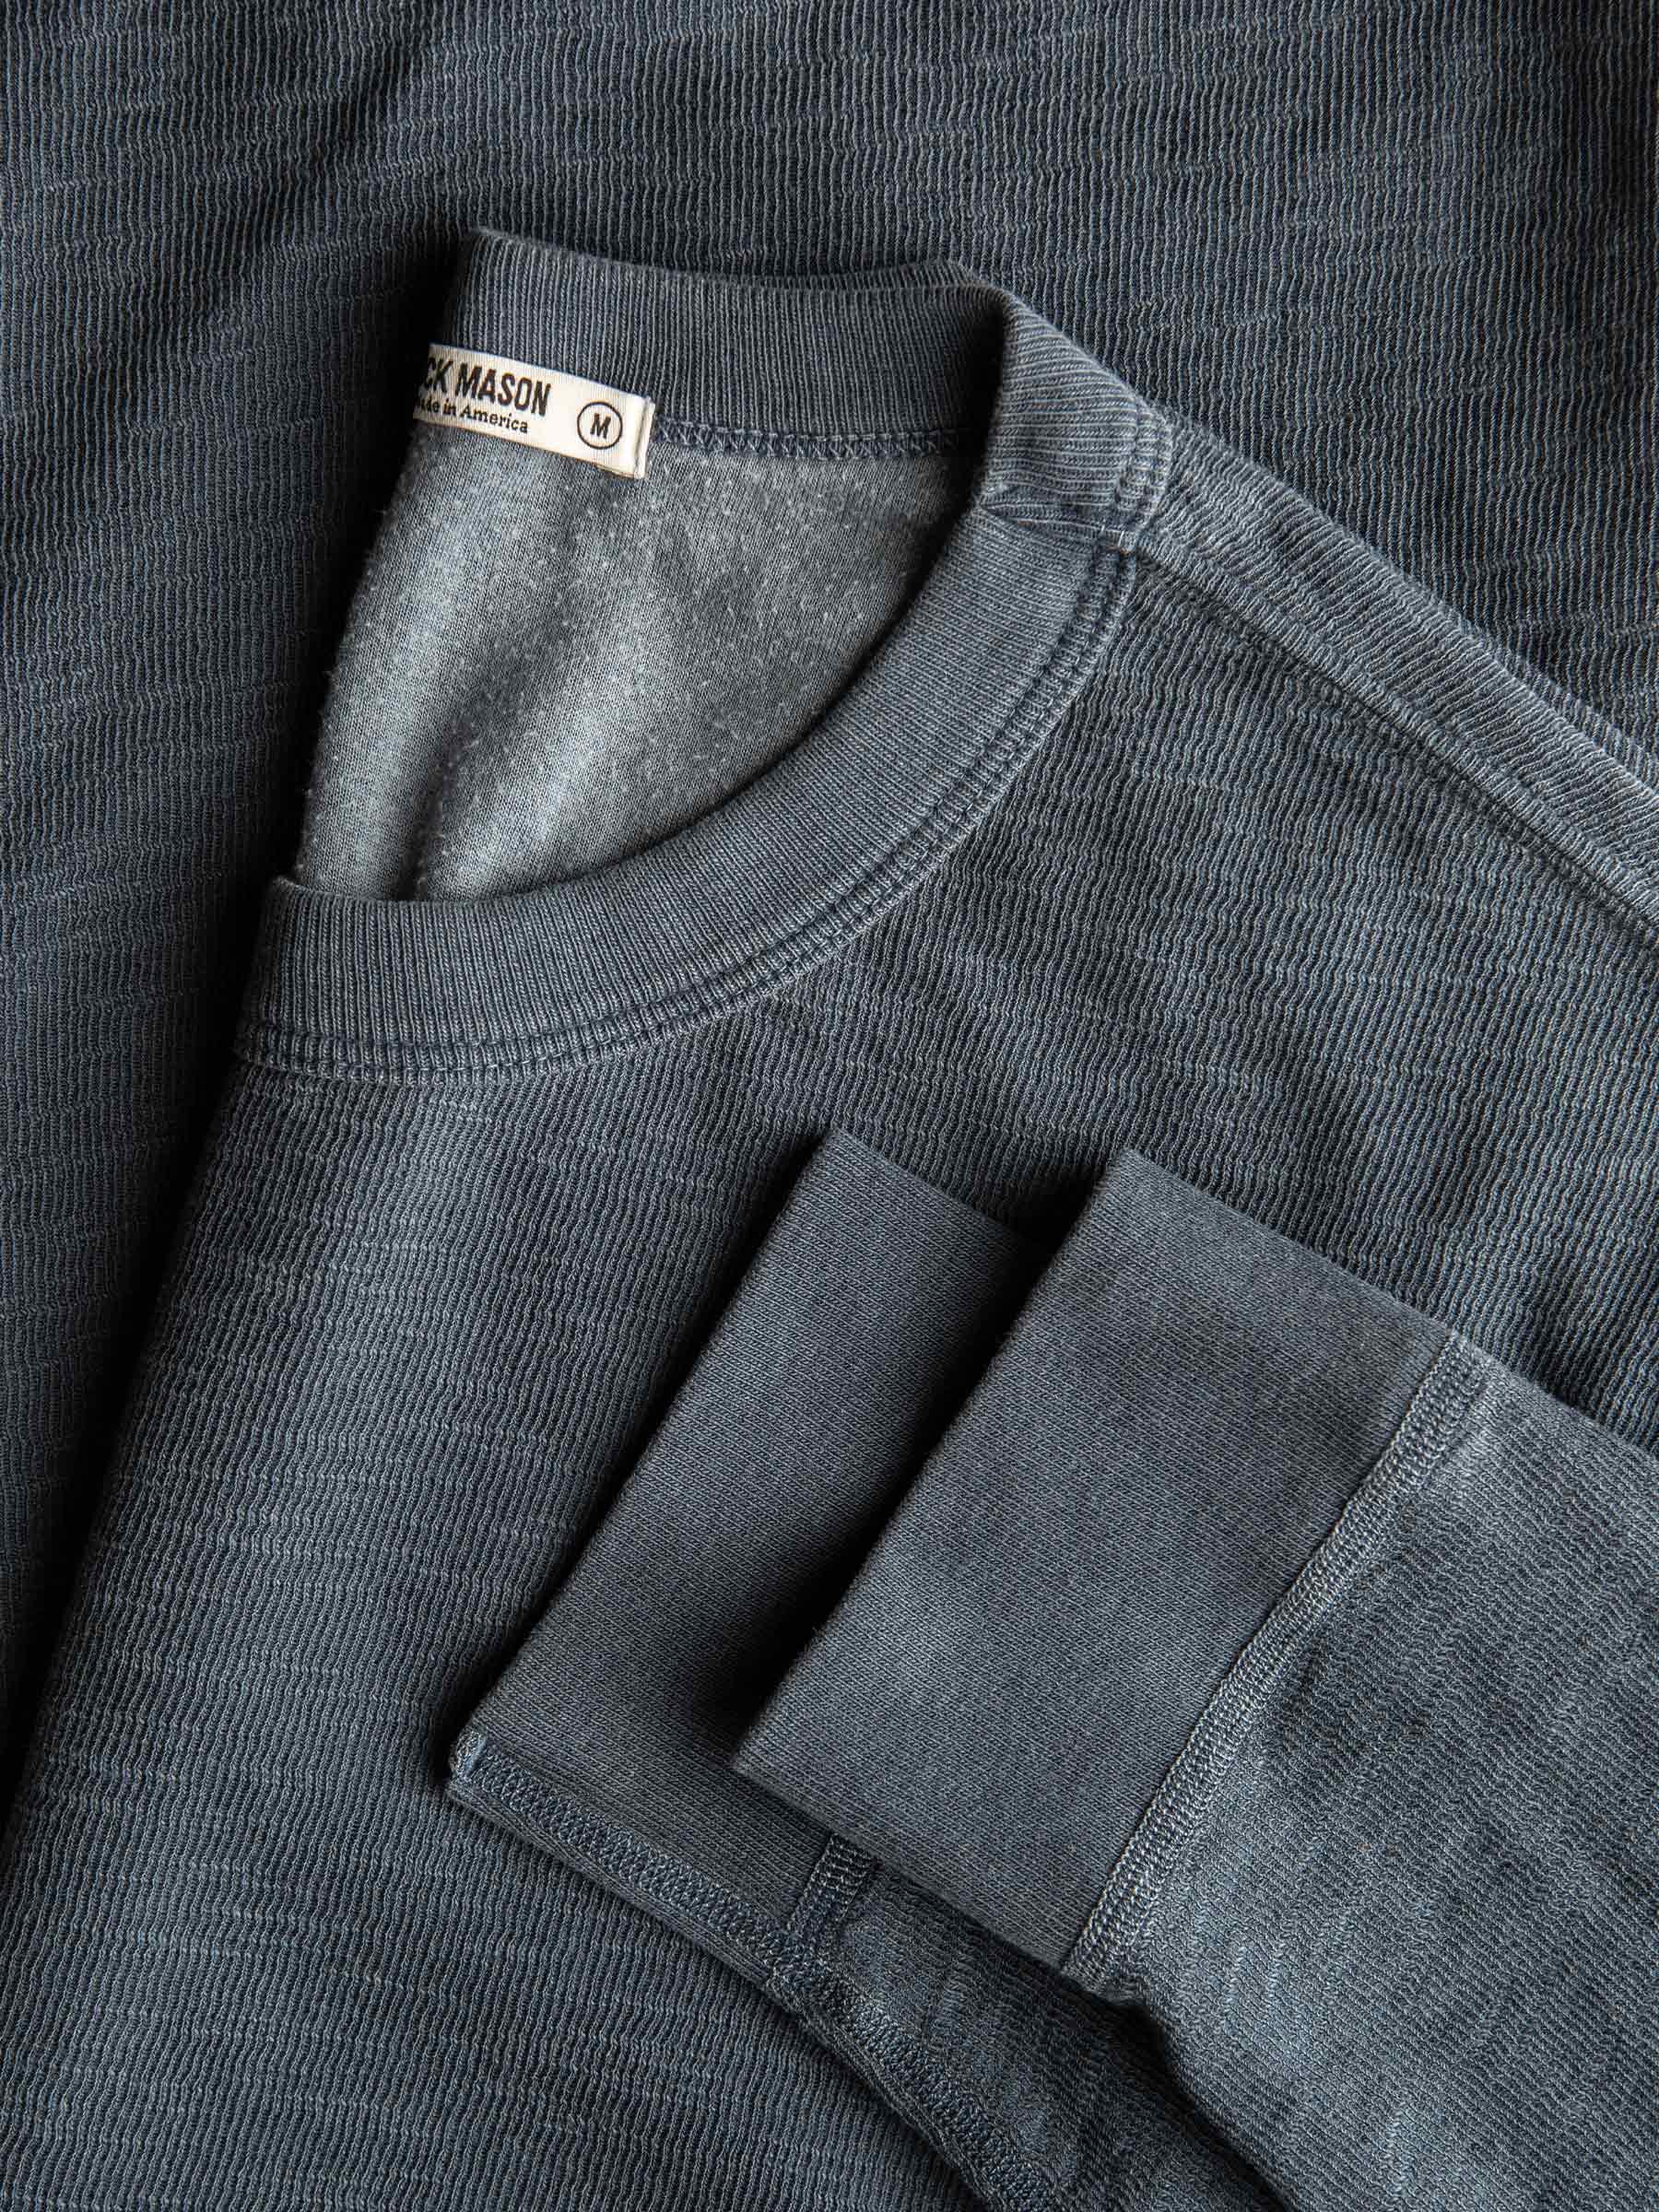 Buck Mason - Dune Venice Wash Lightweight Double Slub Sweatshirt